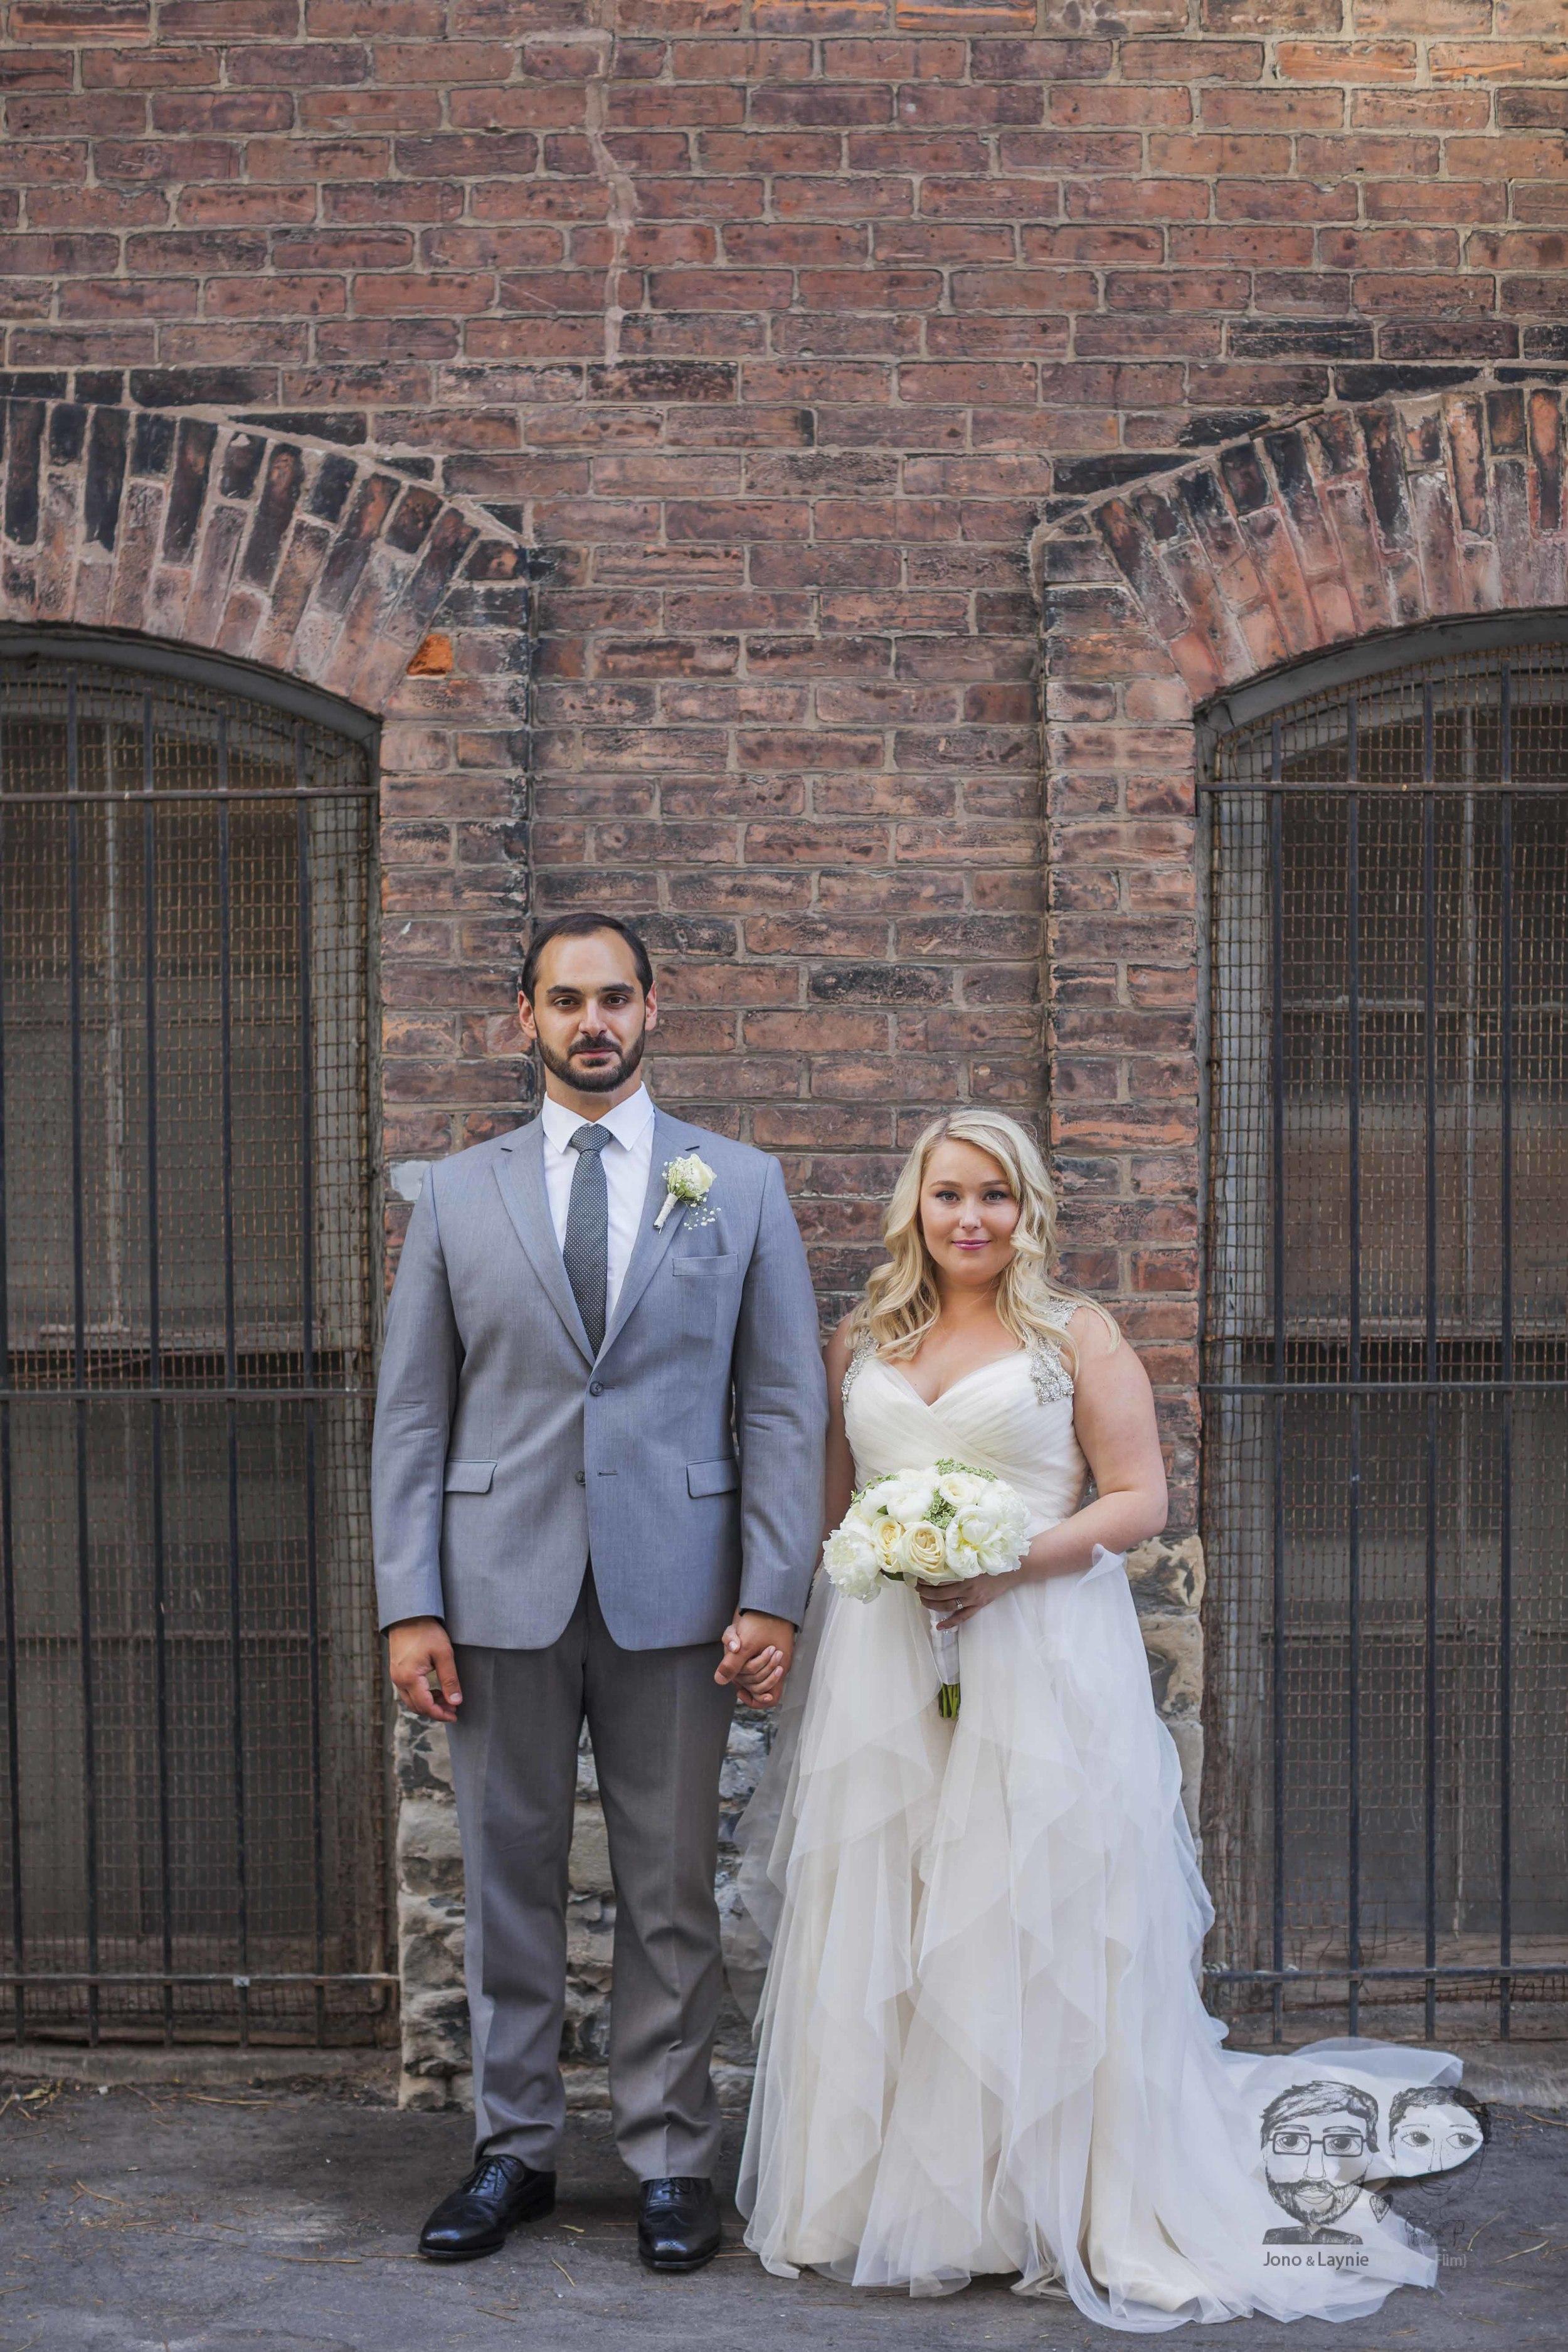 087Berkeley Church-Toronto Photographers-Jono & Laynie Co.jpg